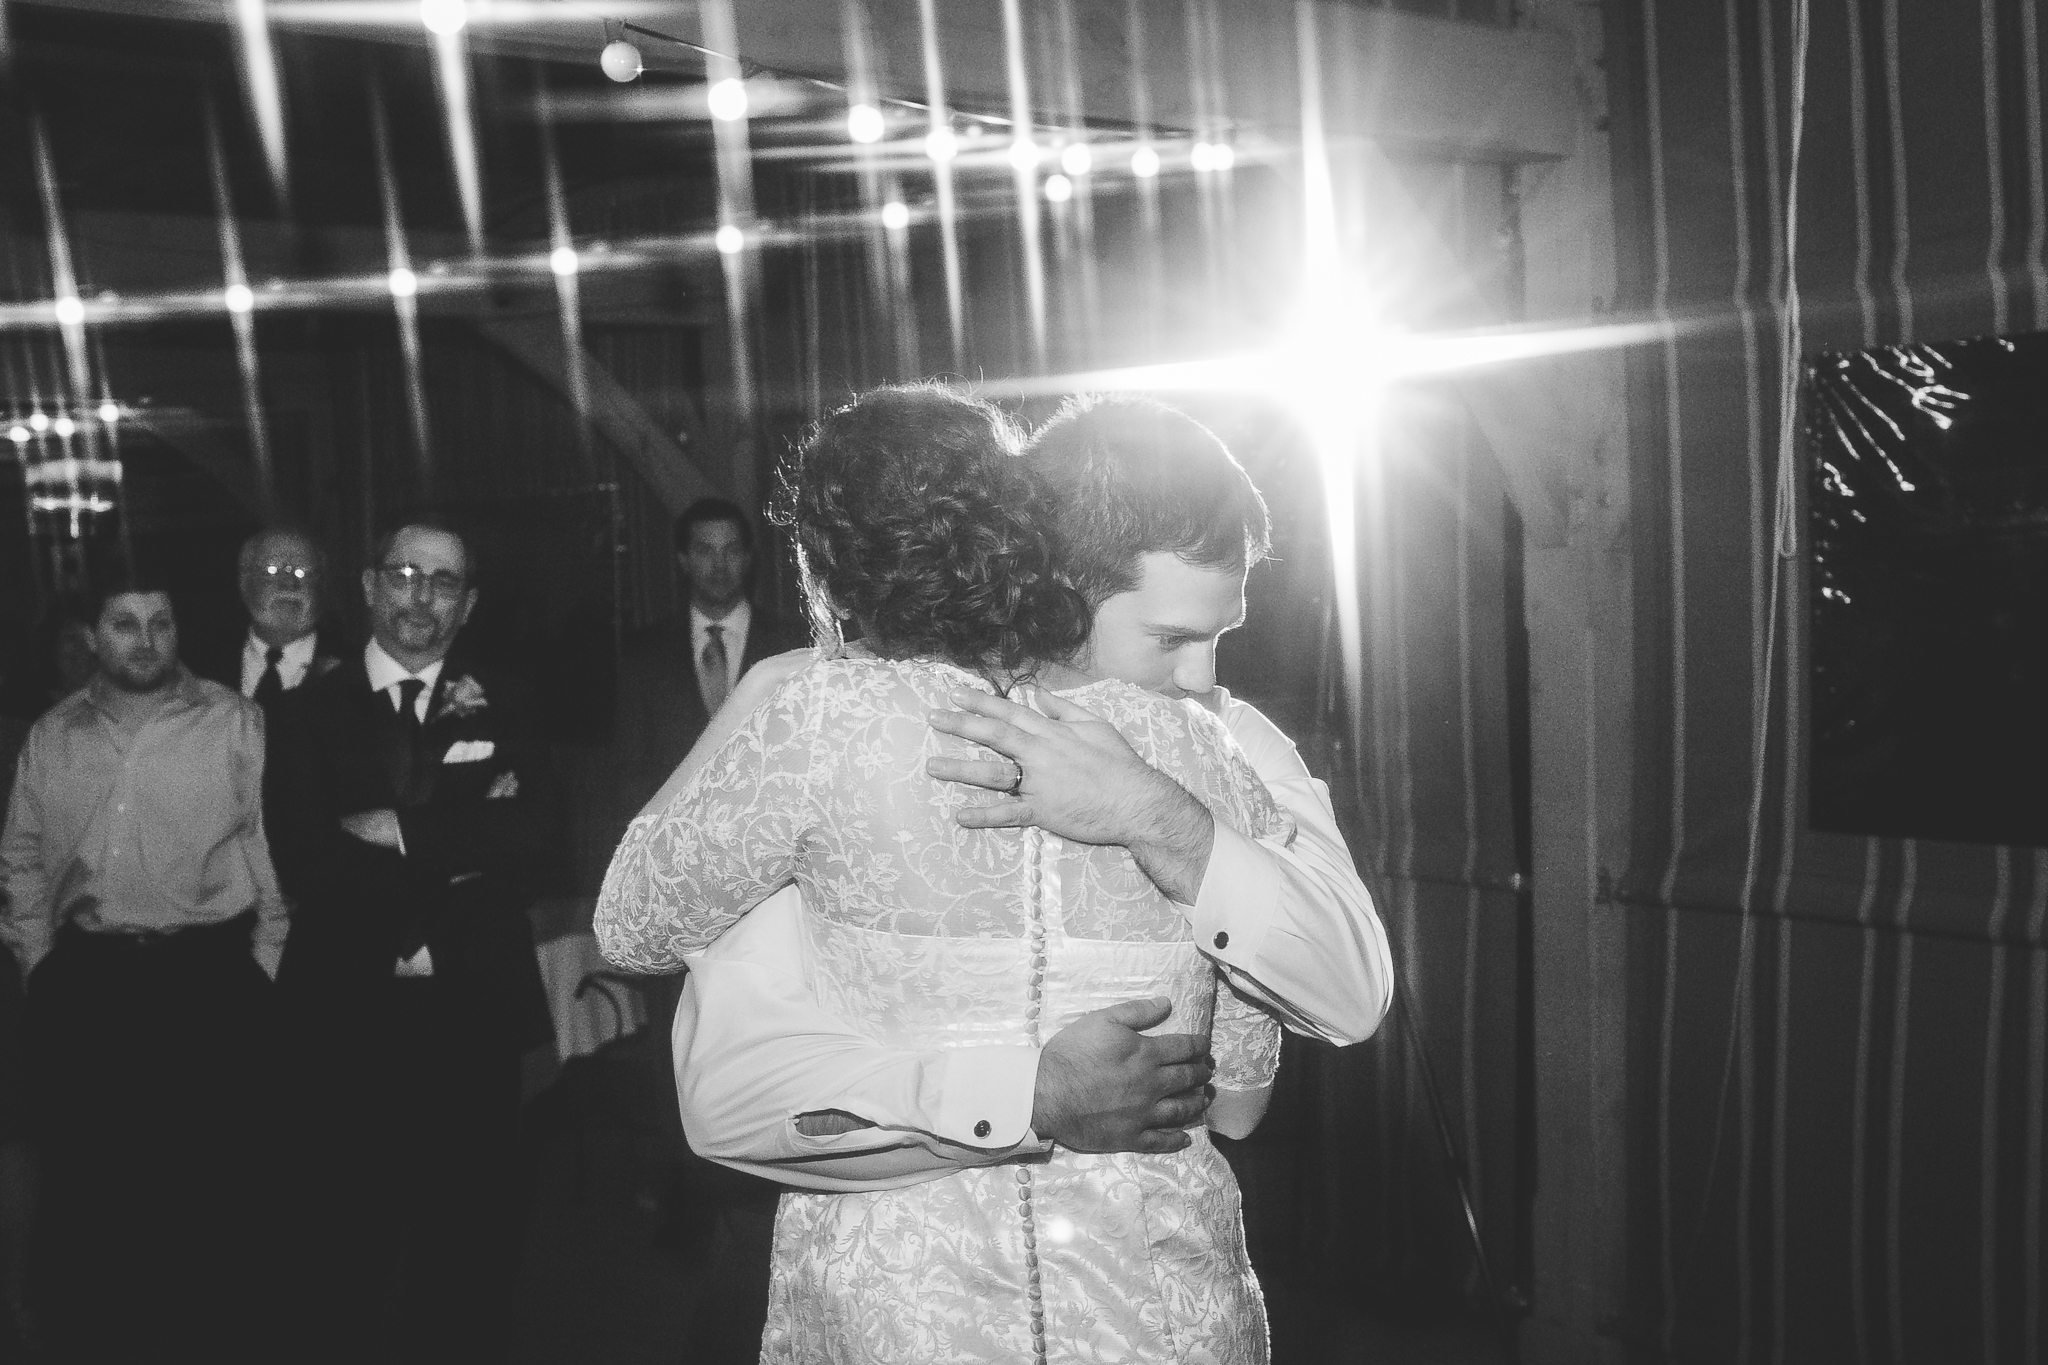 camuglia-whomstudio-chelsea_and_andy-nycphotographer-wedding-brooklyn-buffalo-timberlodge-114-5602.jpg